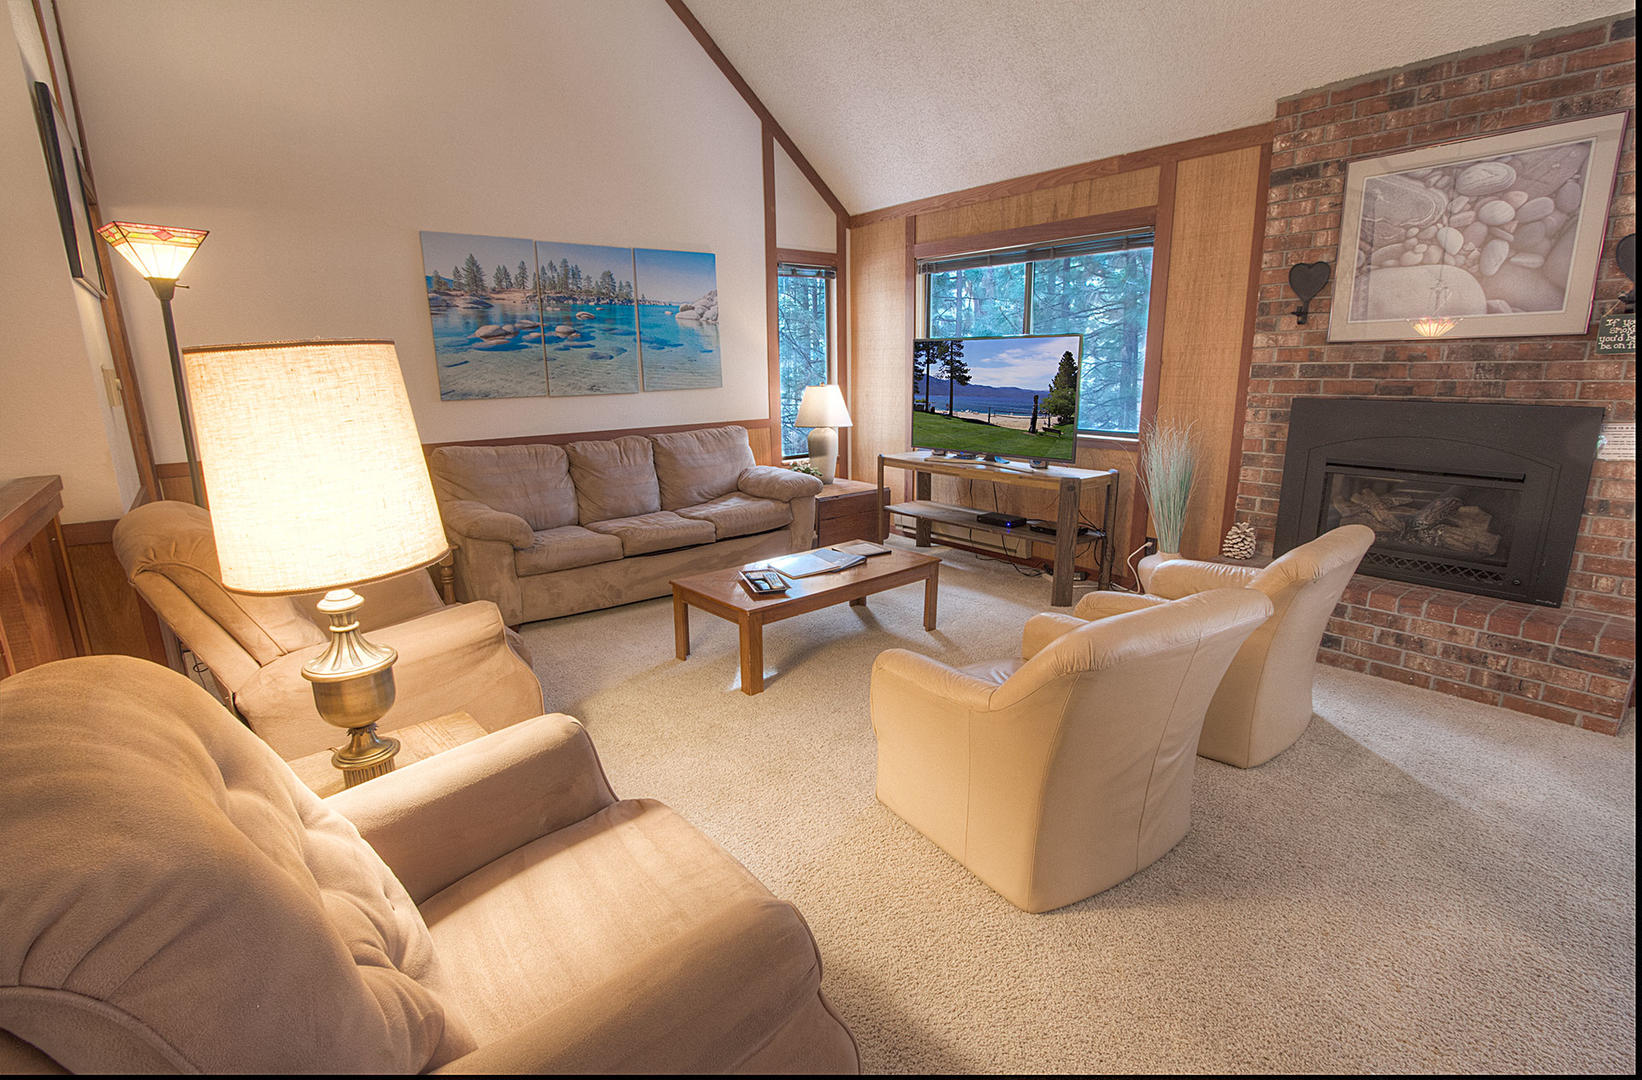 ivc0822 Living Room